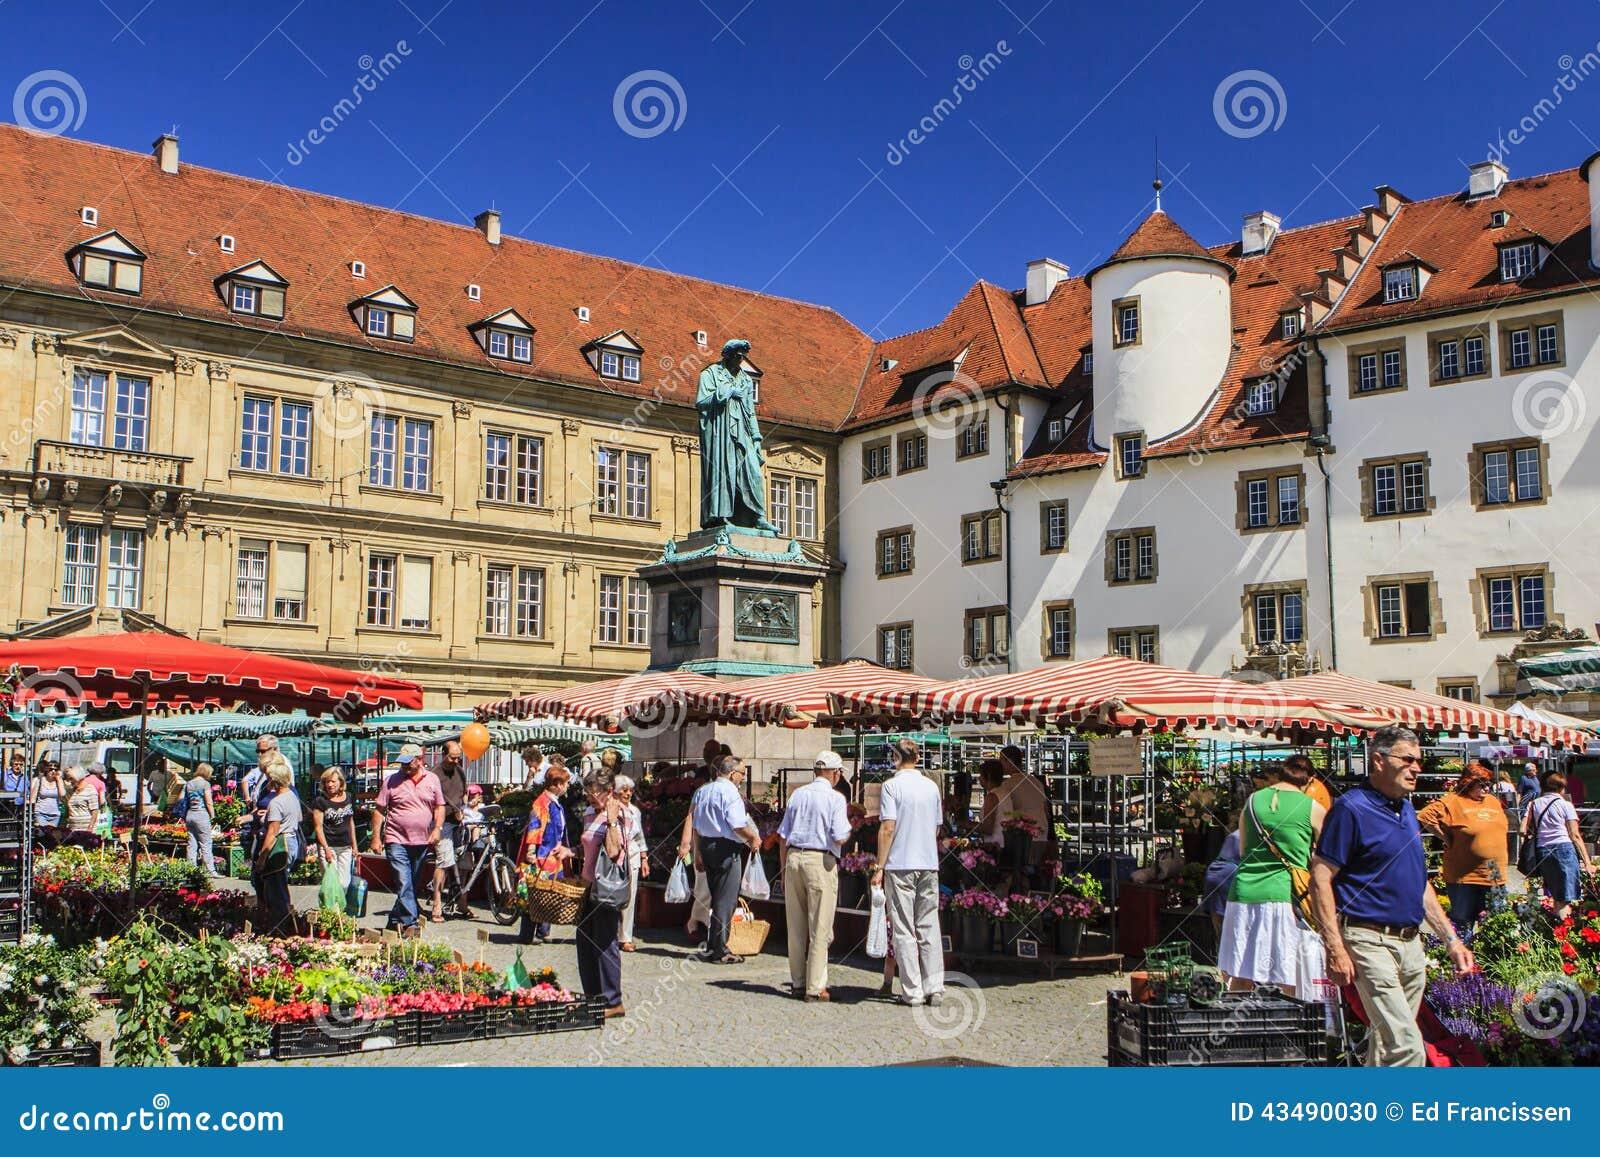 Market in Stuttgart, Germany.